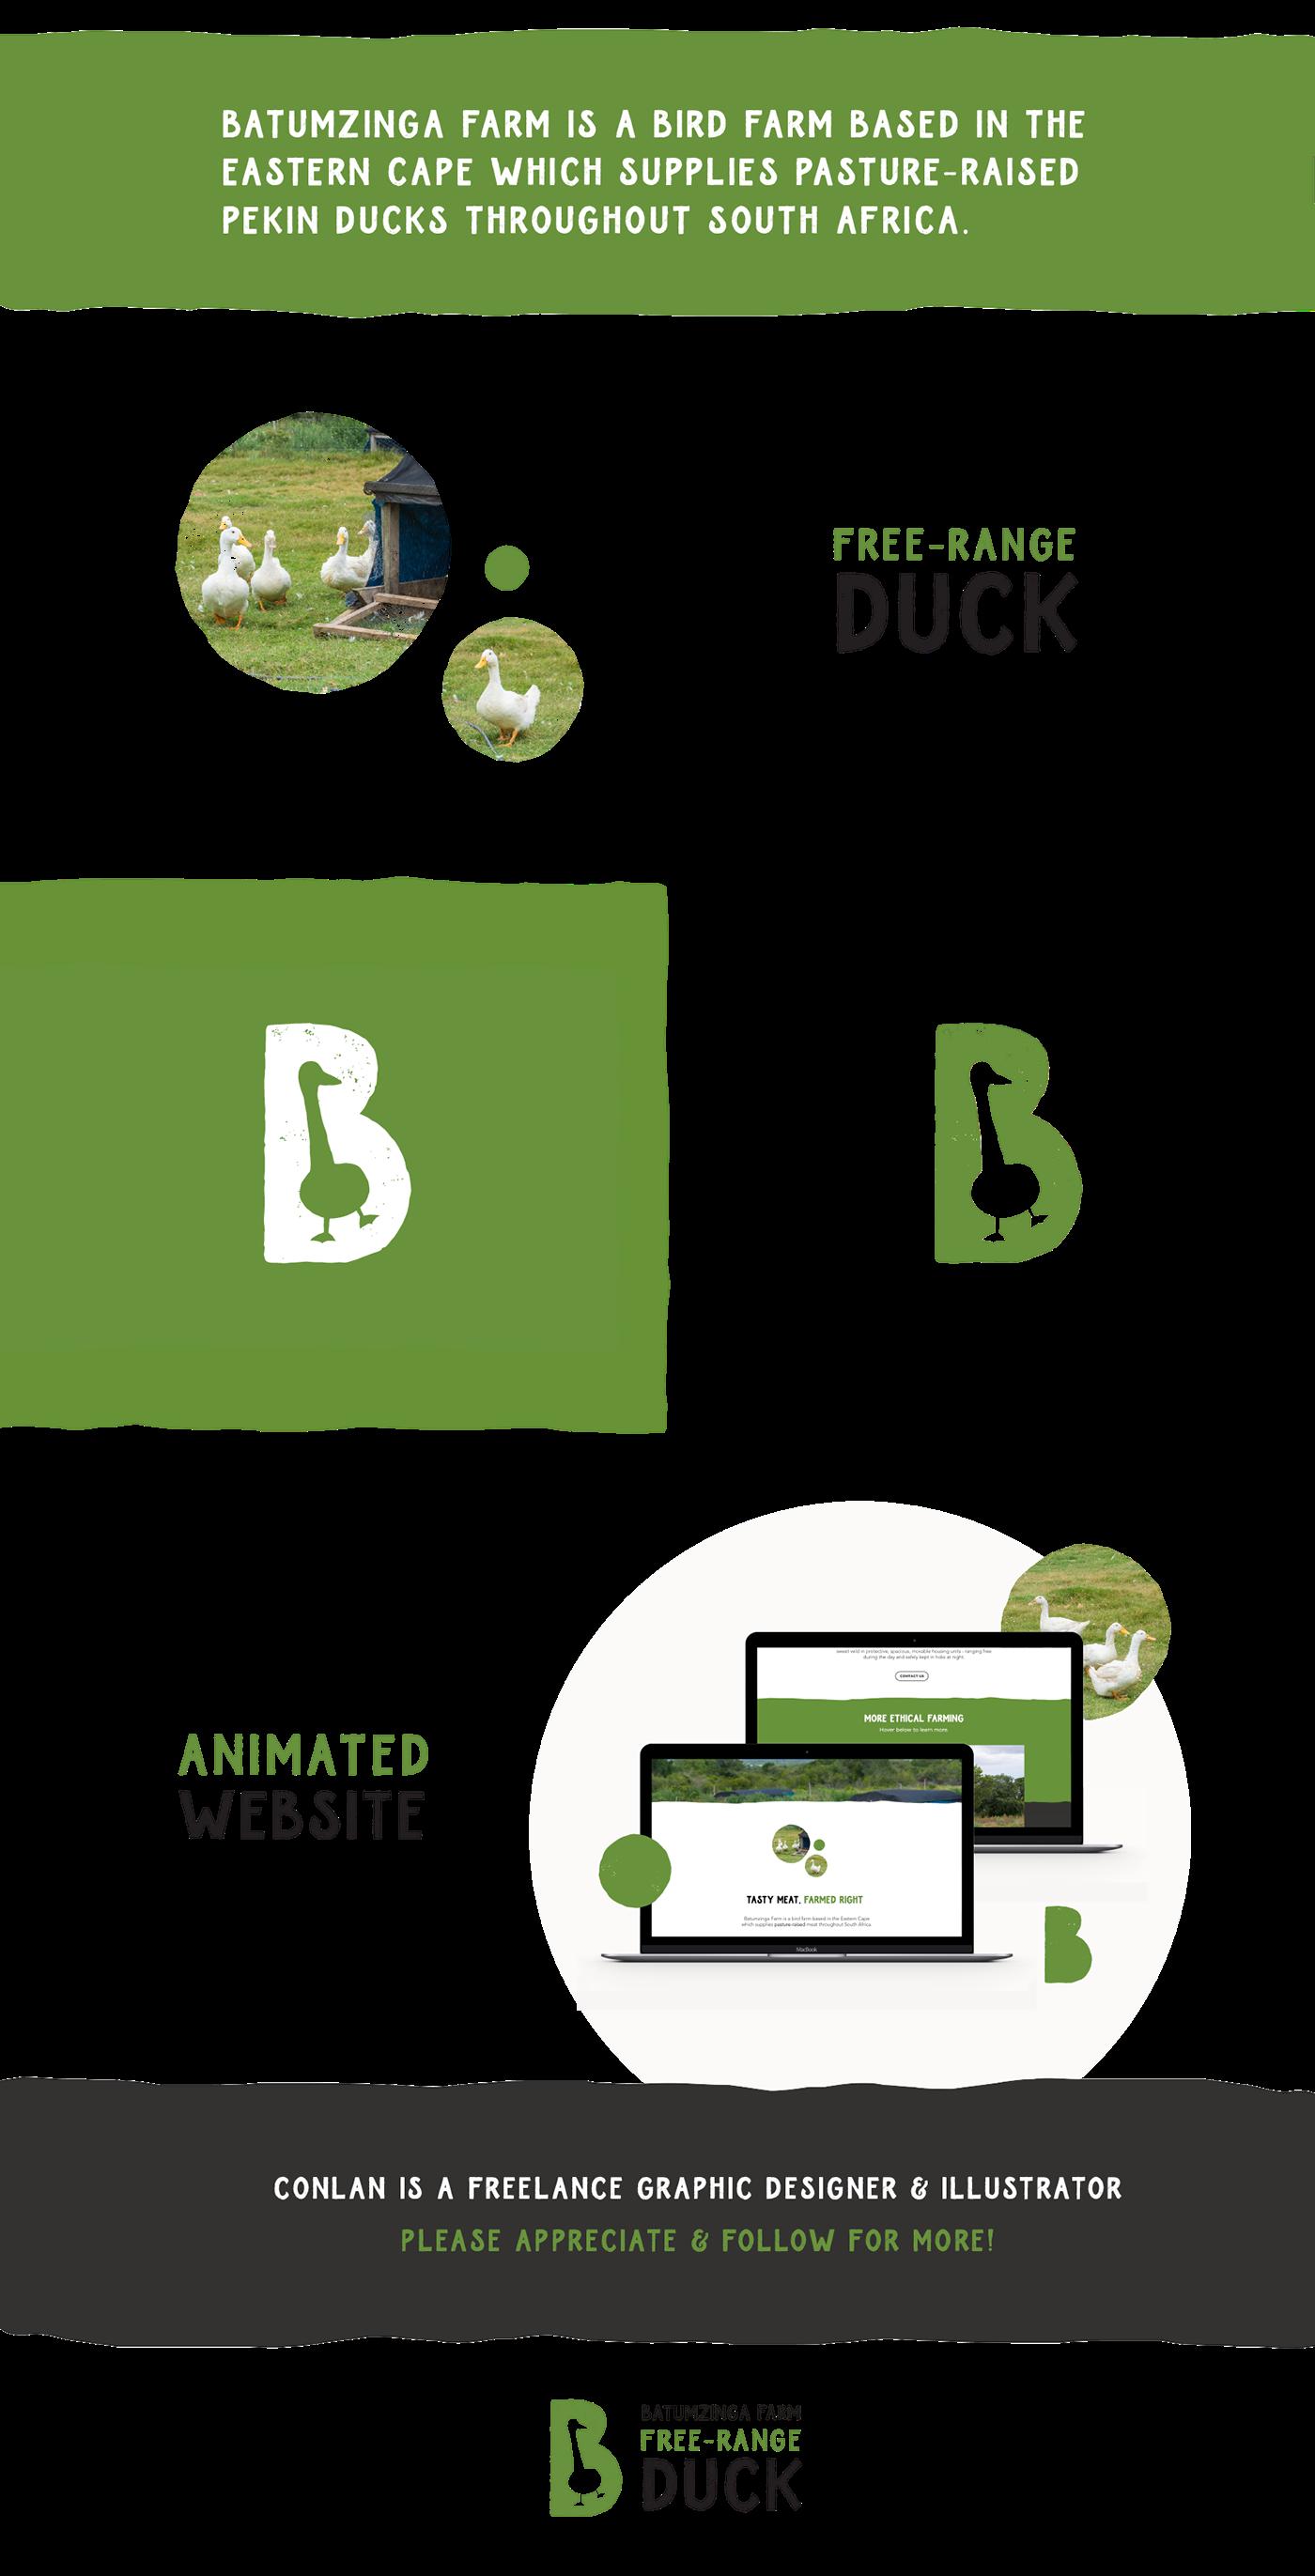 farm Playful visual language logo branding  green animals Batumzinga rustic informal